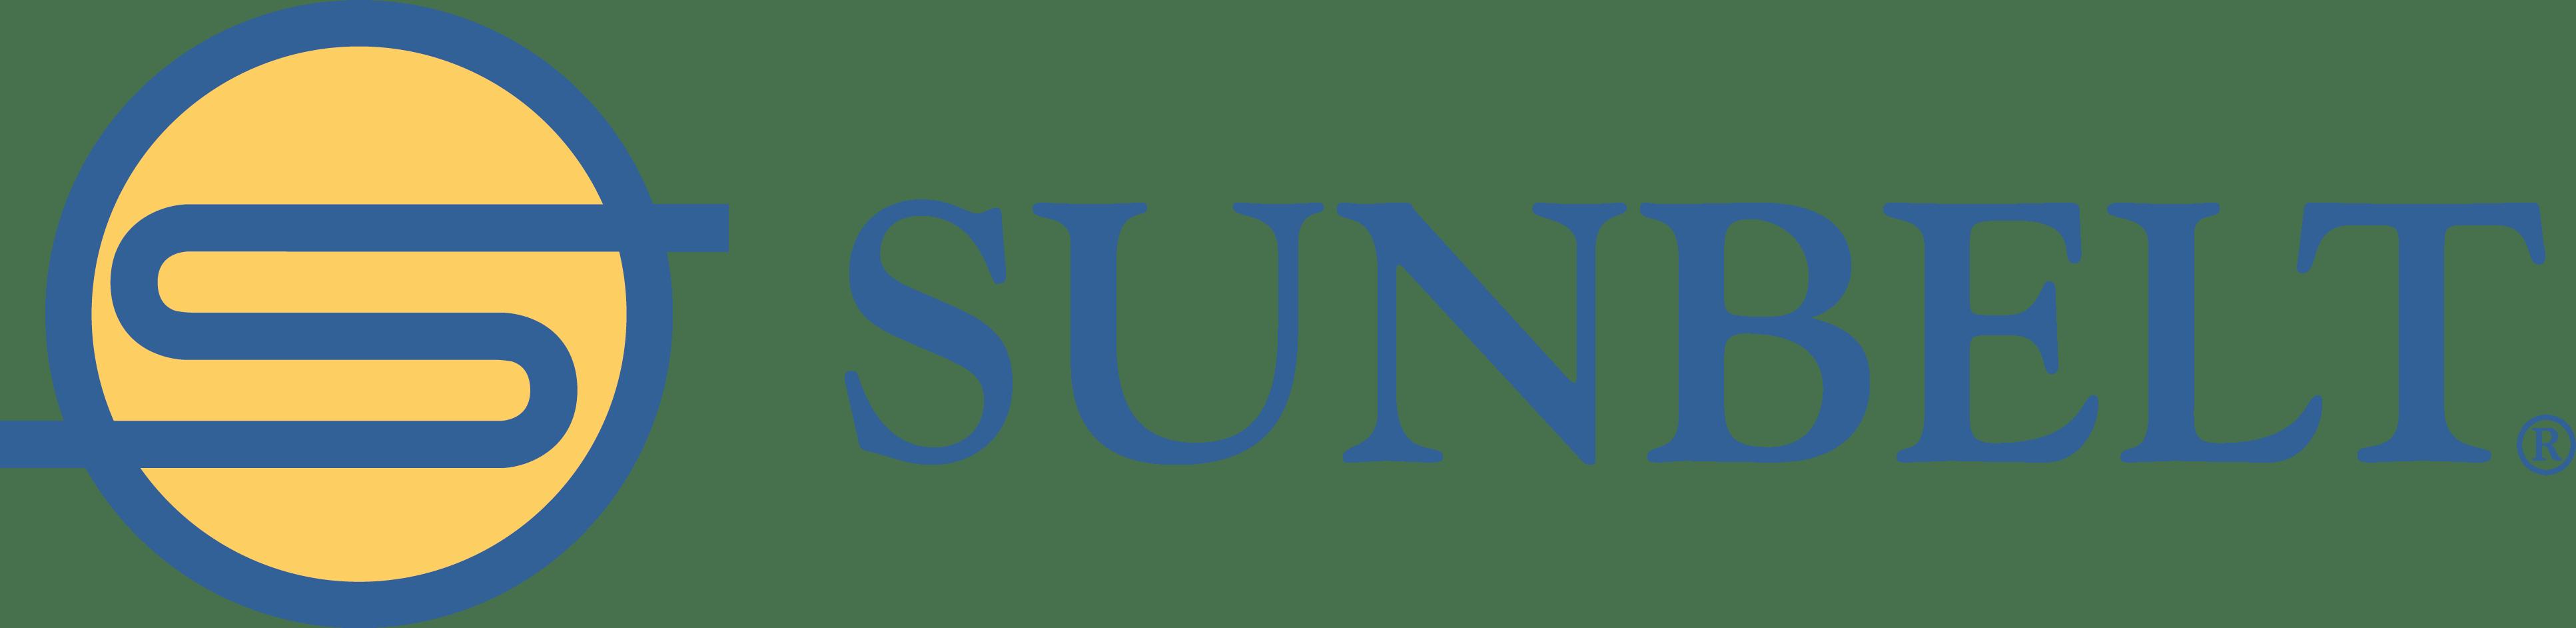 Sunbelt Canada